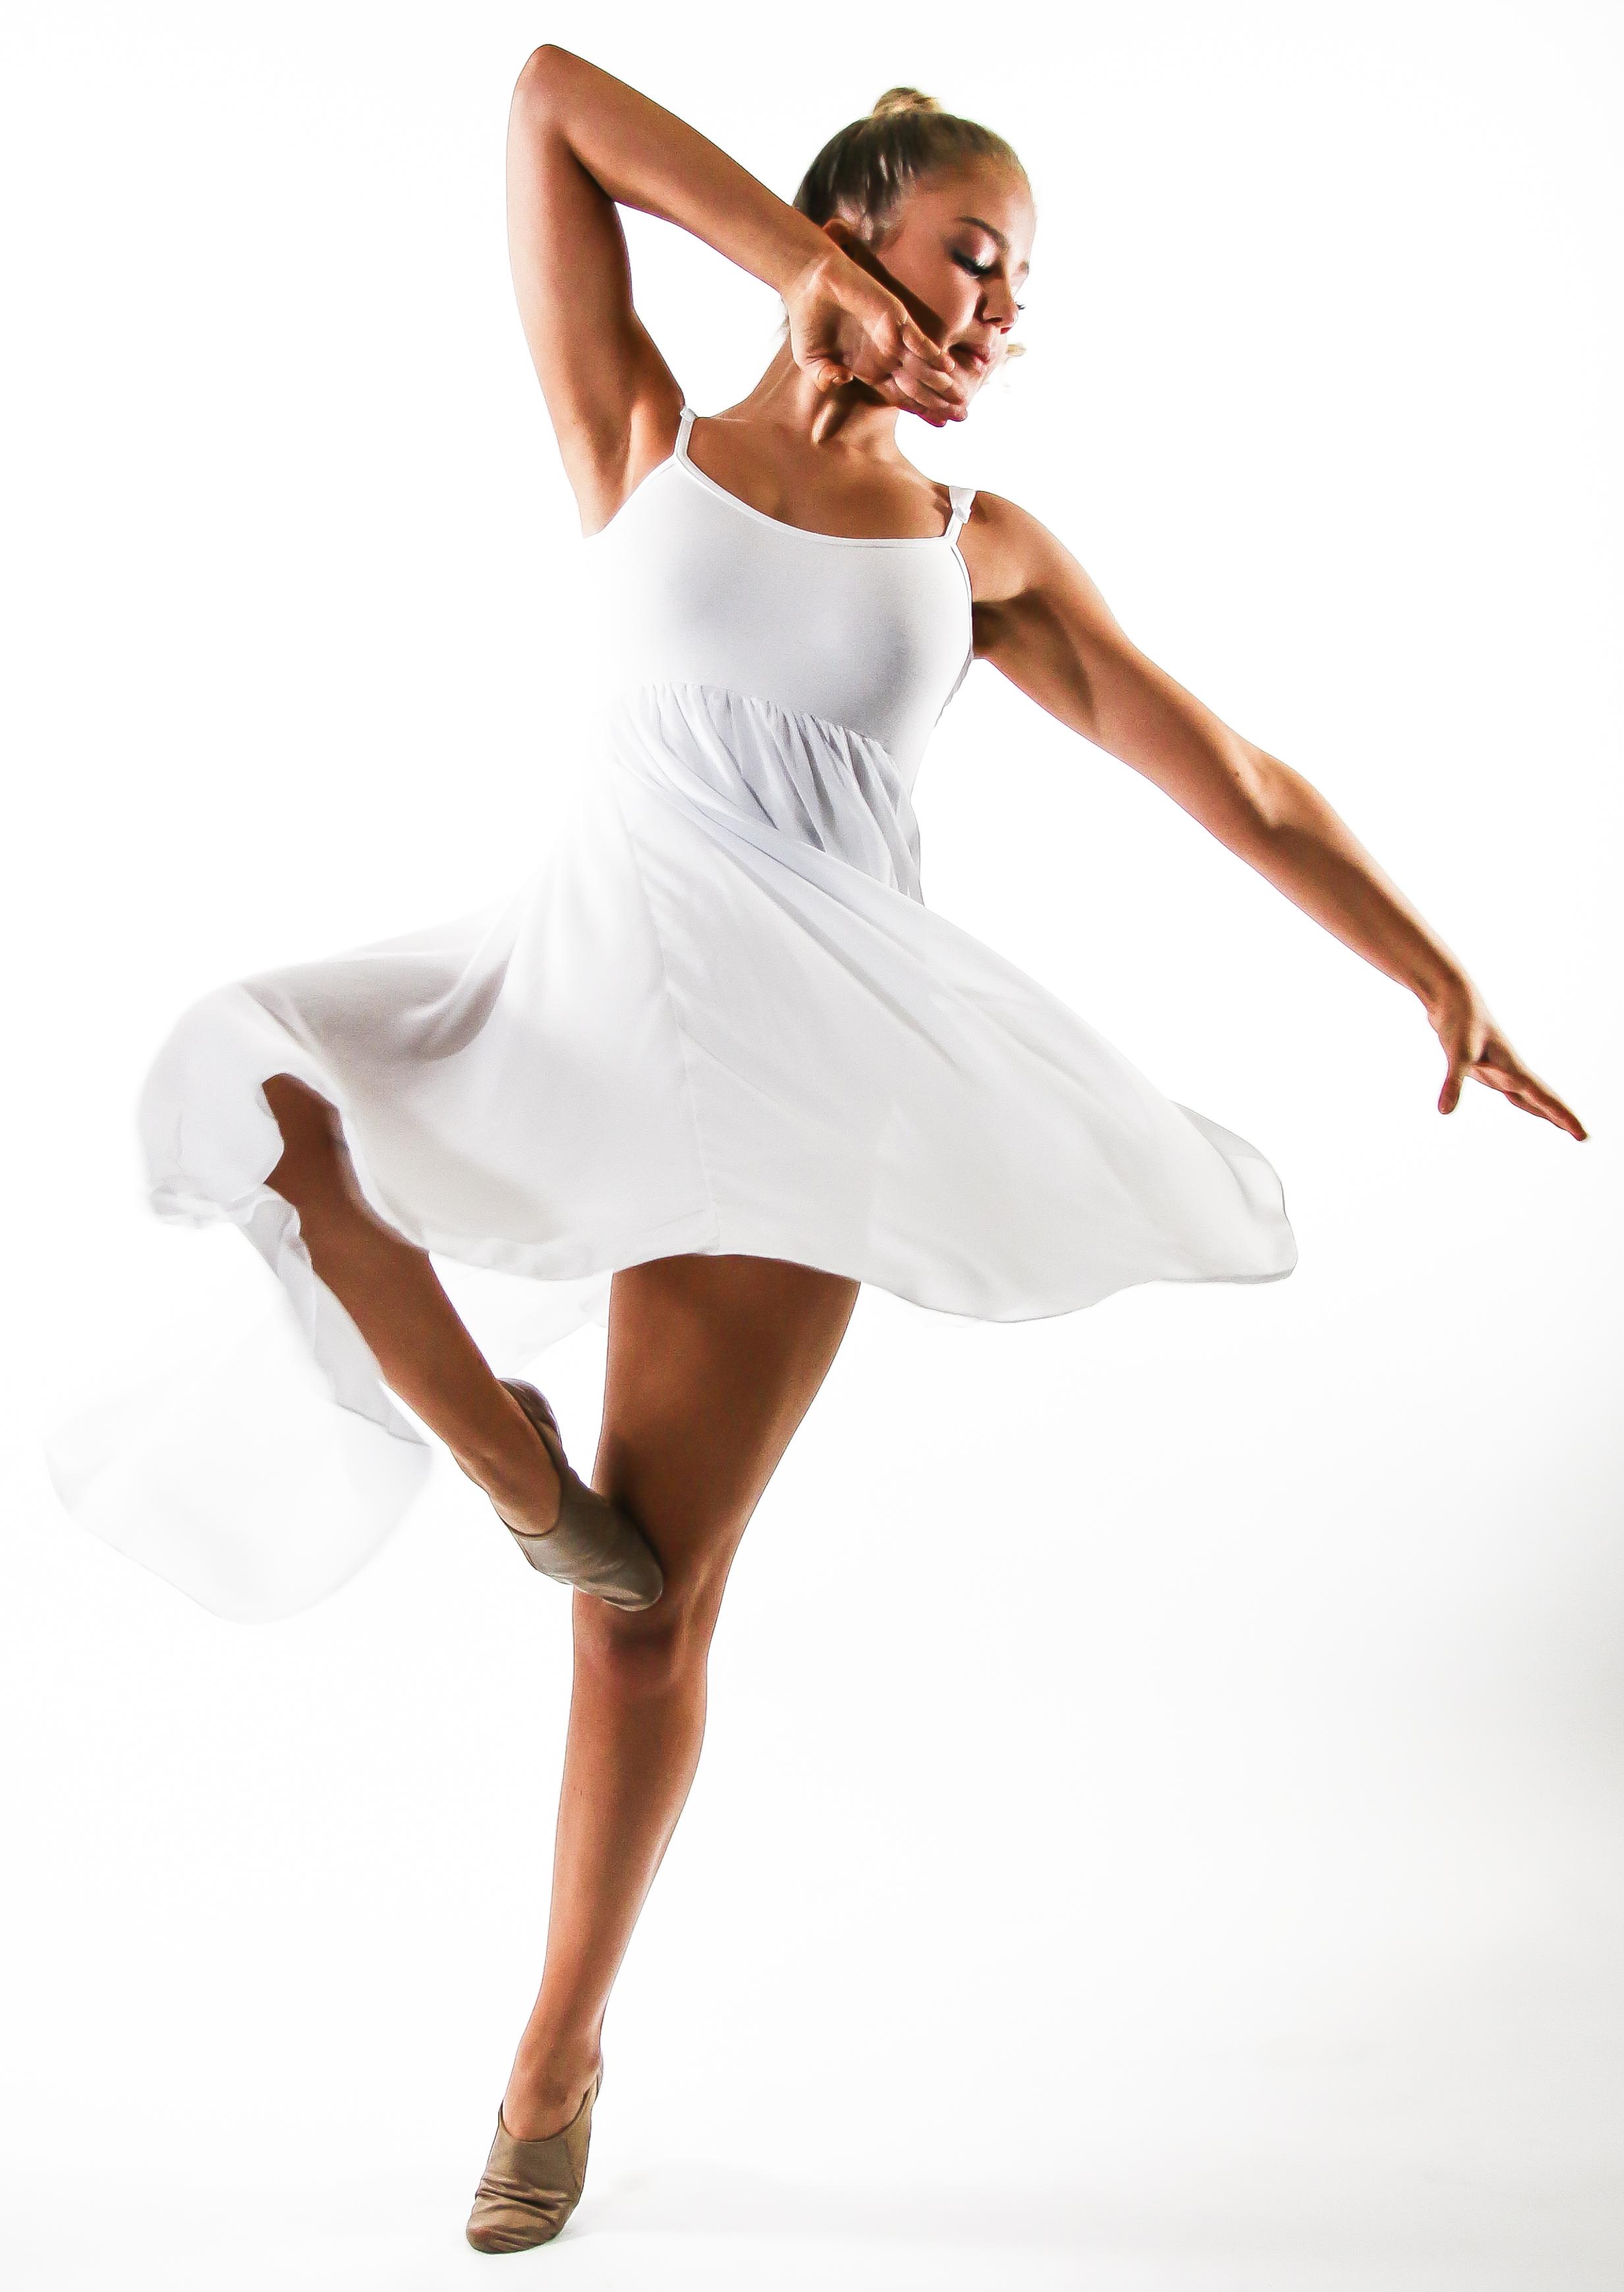 modem dance photography